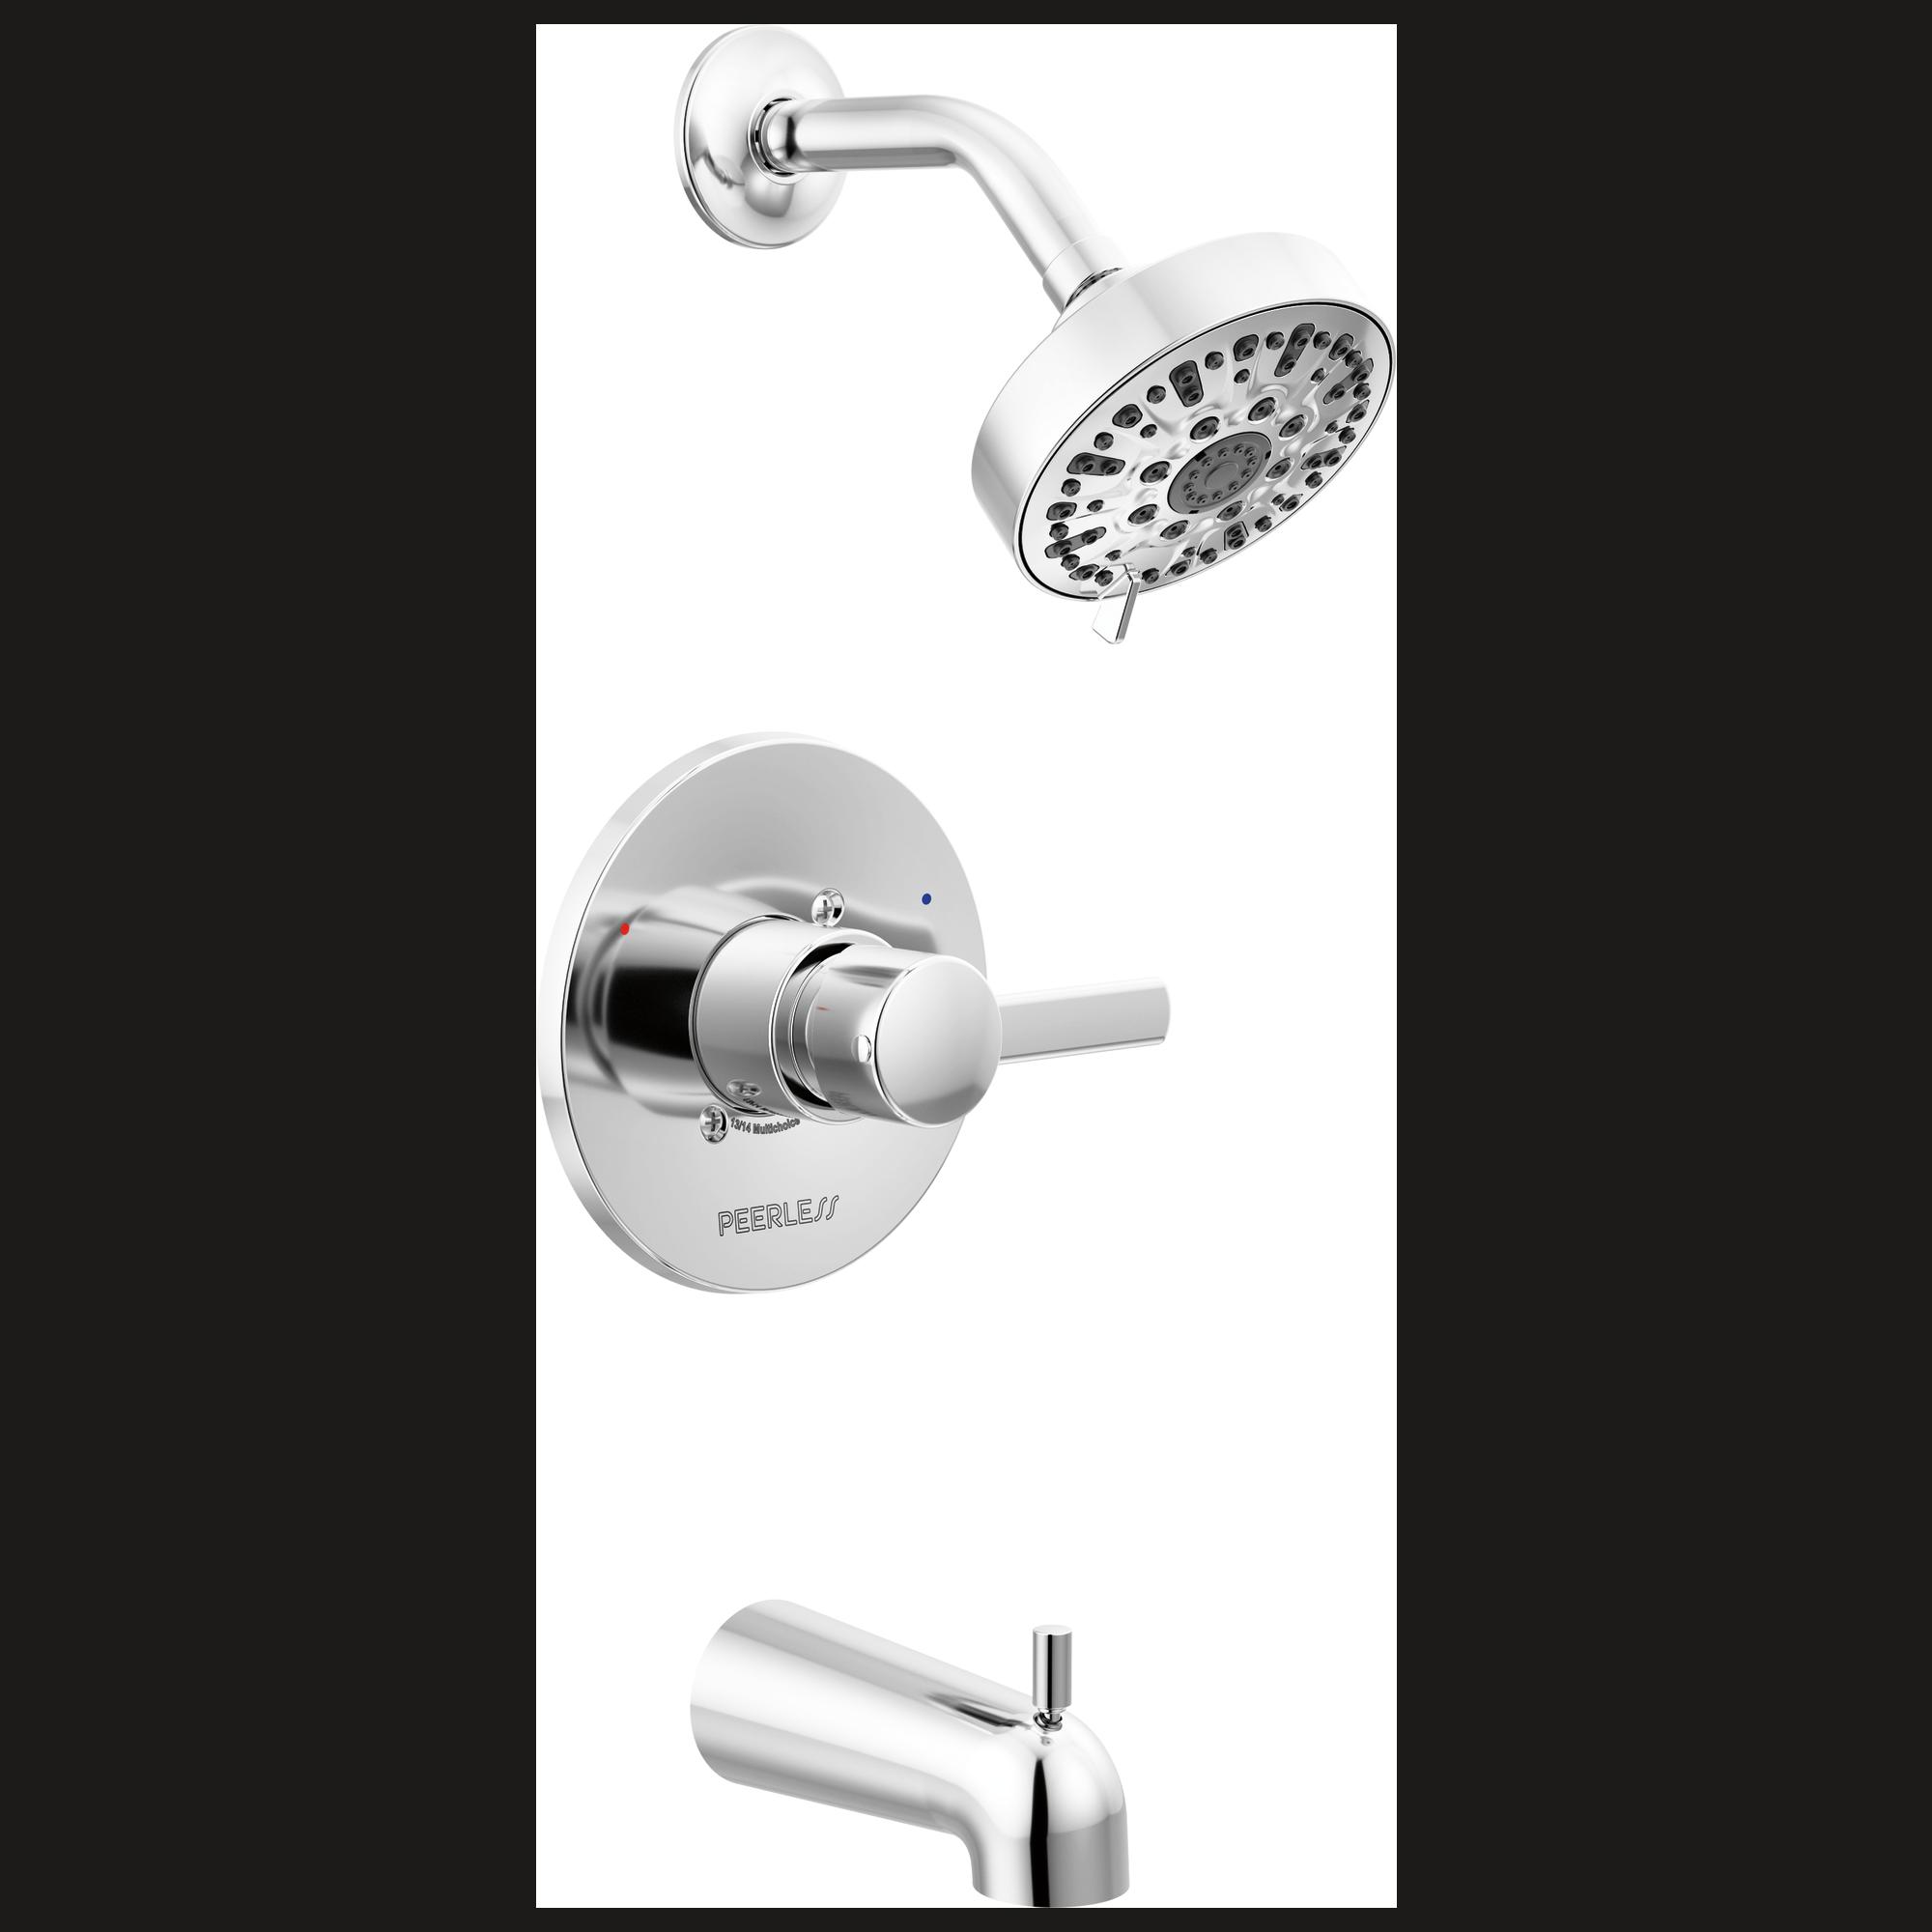 PTT188792 - Tub Shower Trim Kit